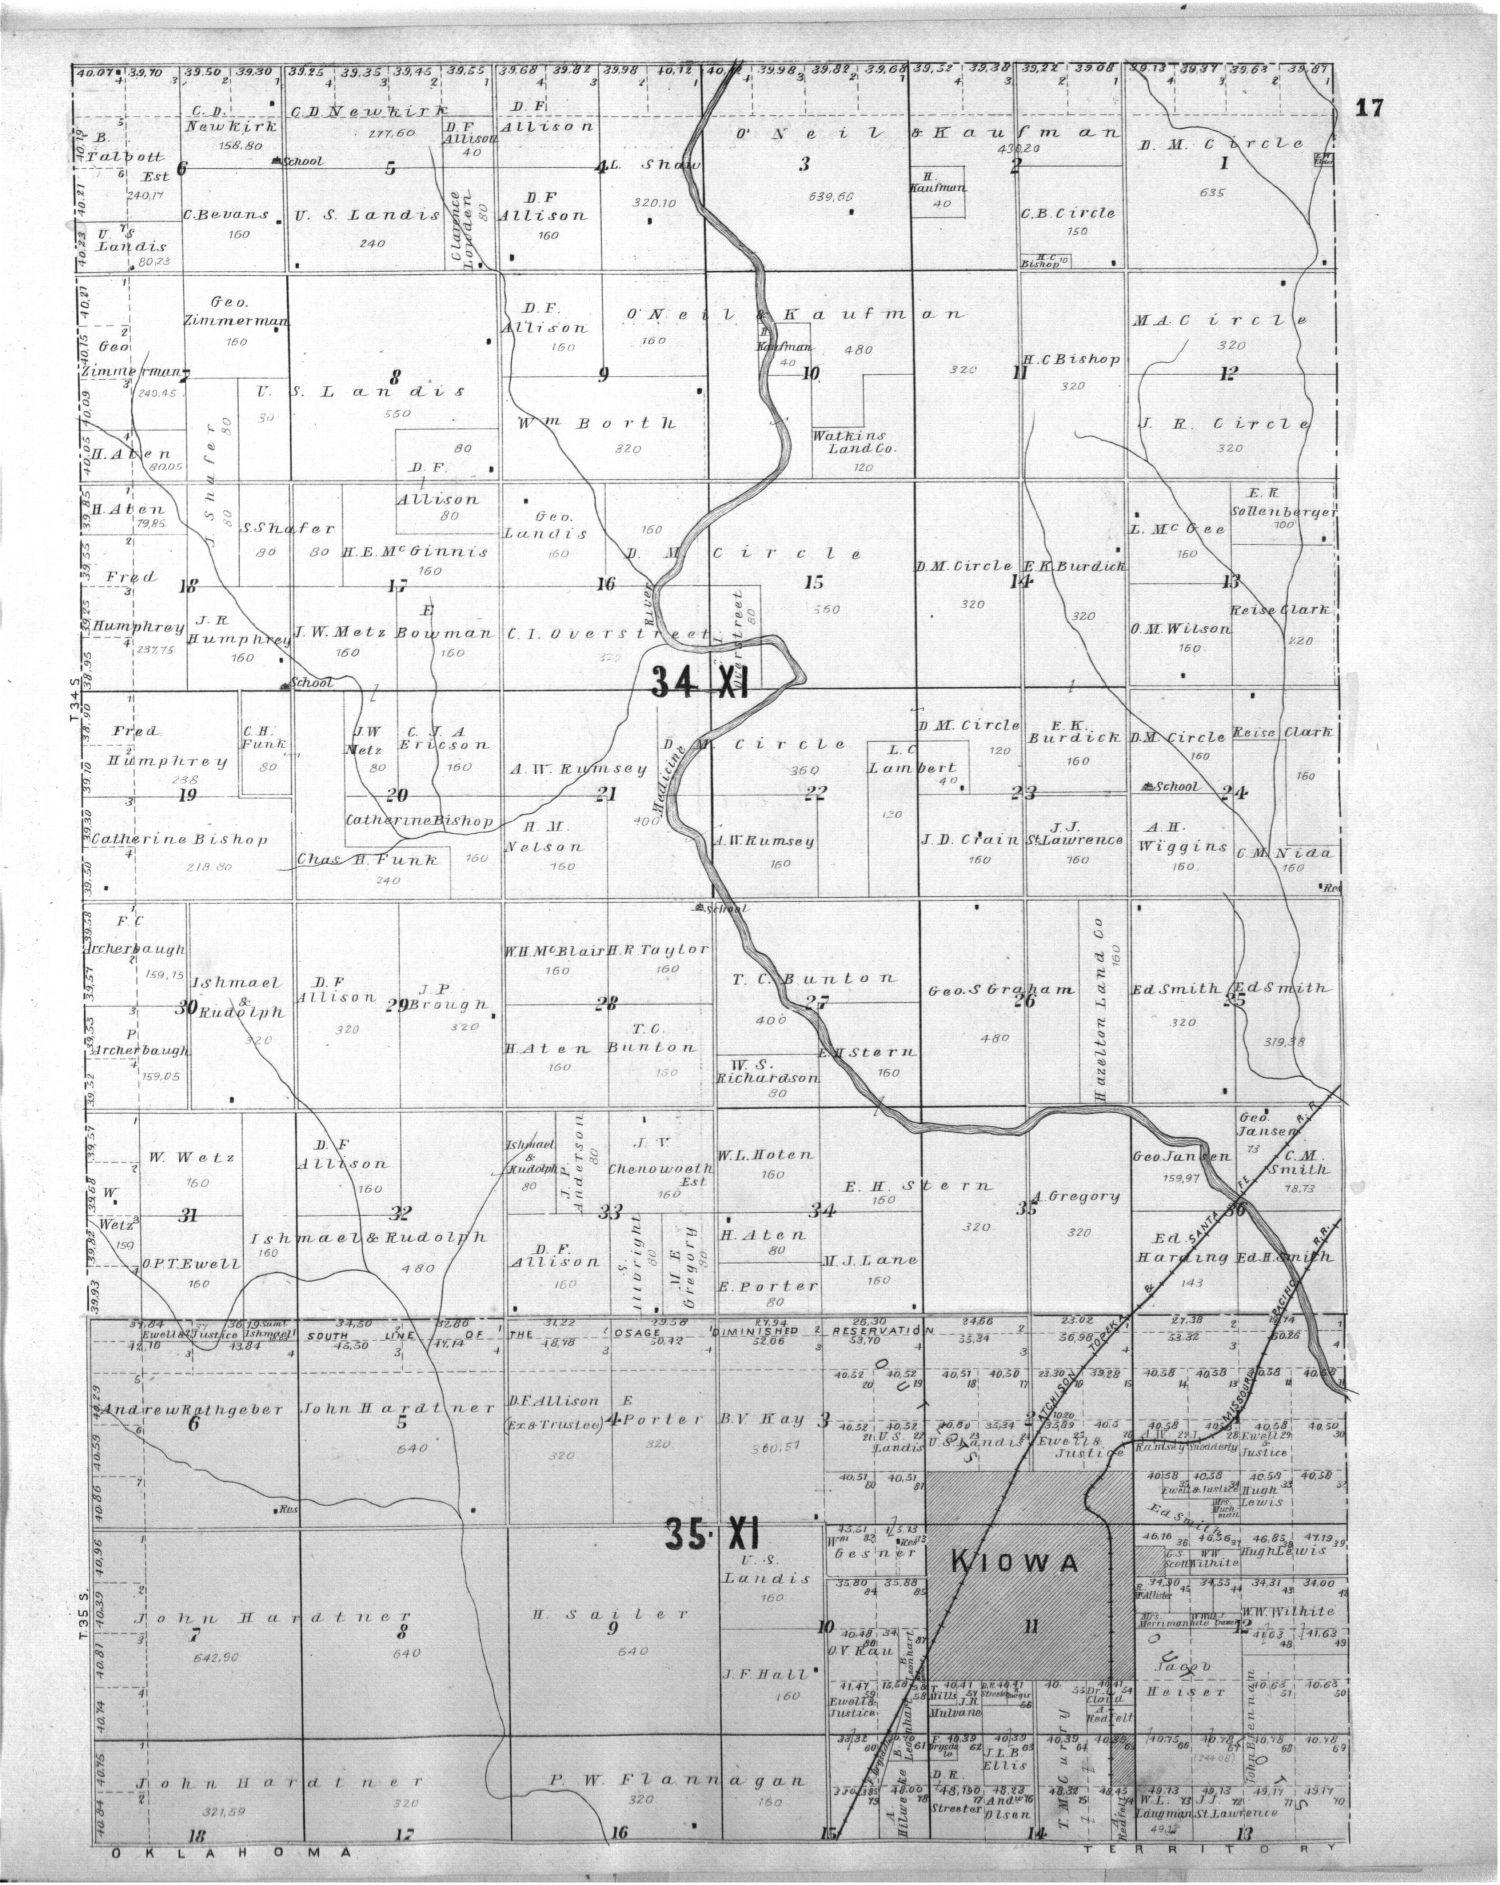 Standard atlas of Barber County, Kansas - 17